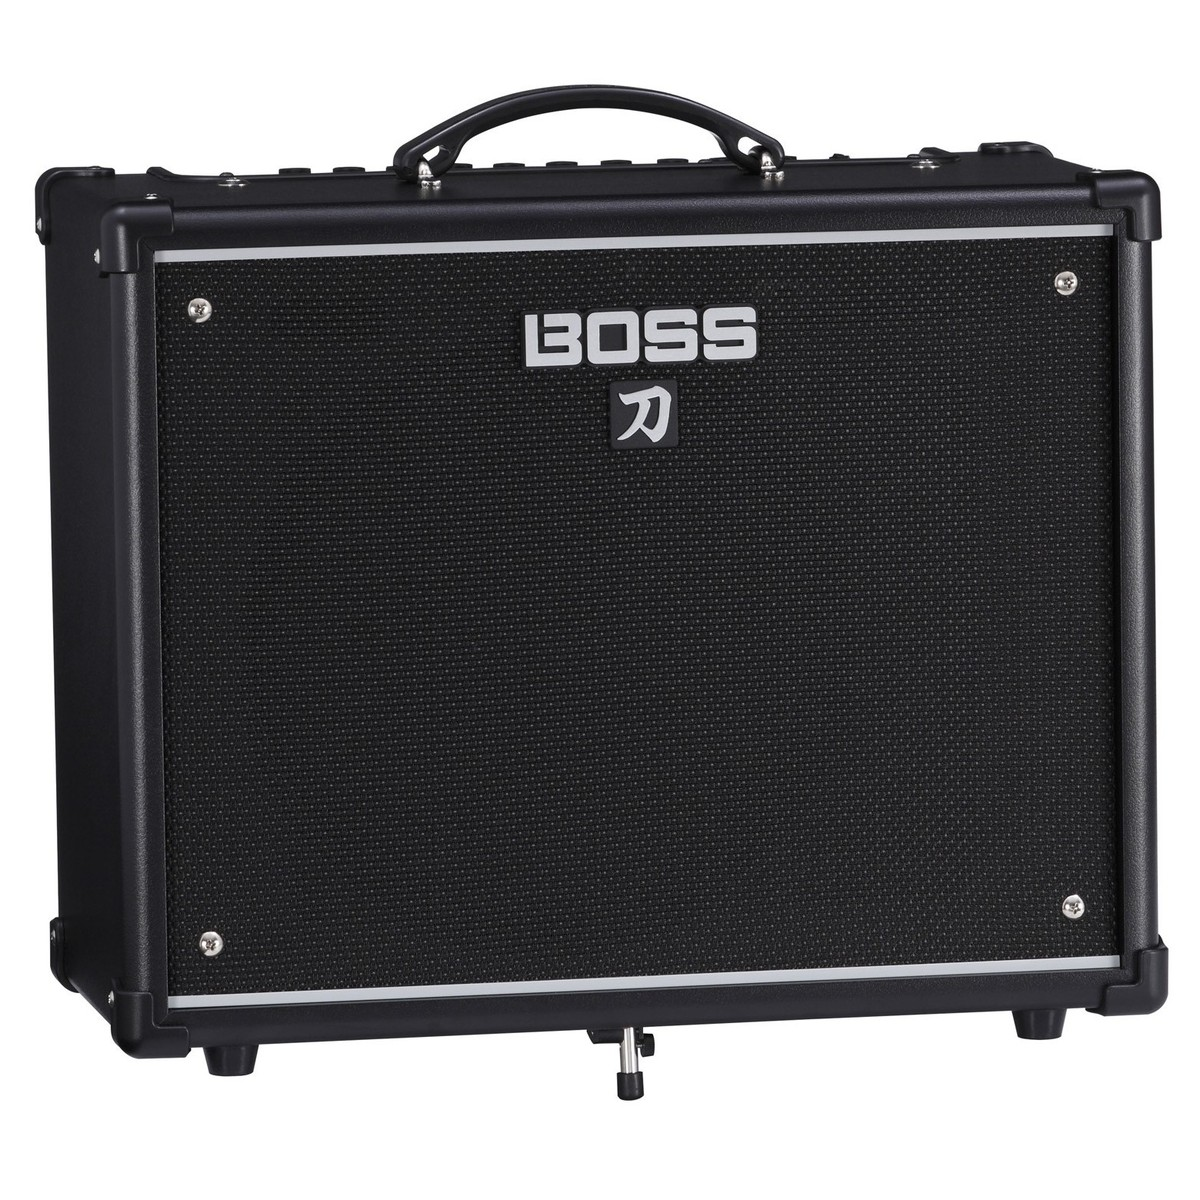 boss katana 50 combo guitar amplifier at. Black Bedroom Furniture Sets. Home Design Ideas